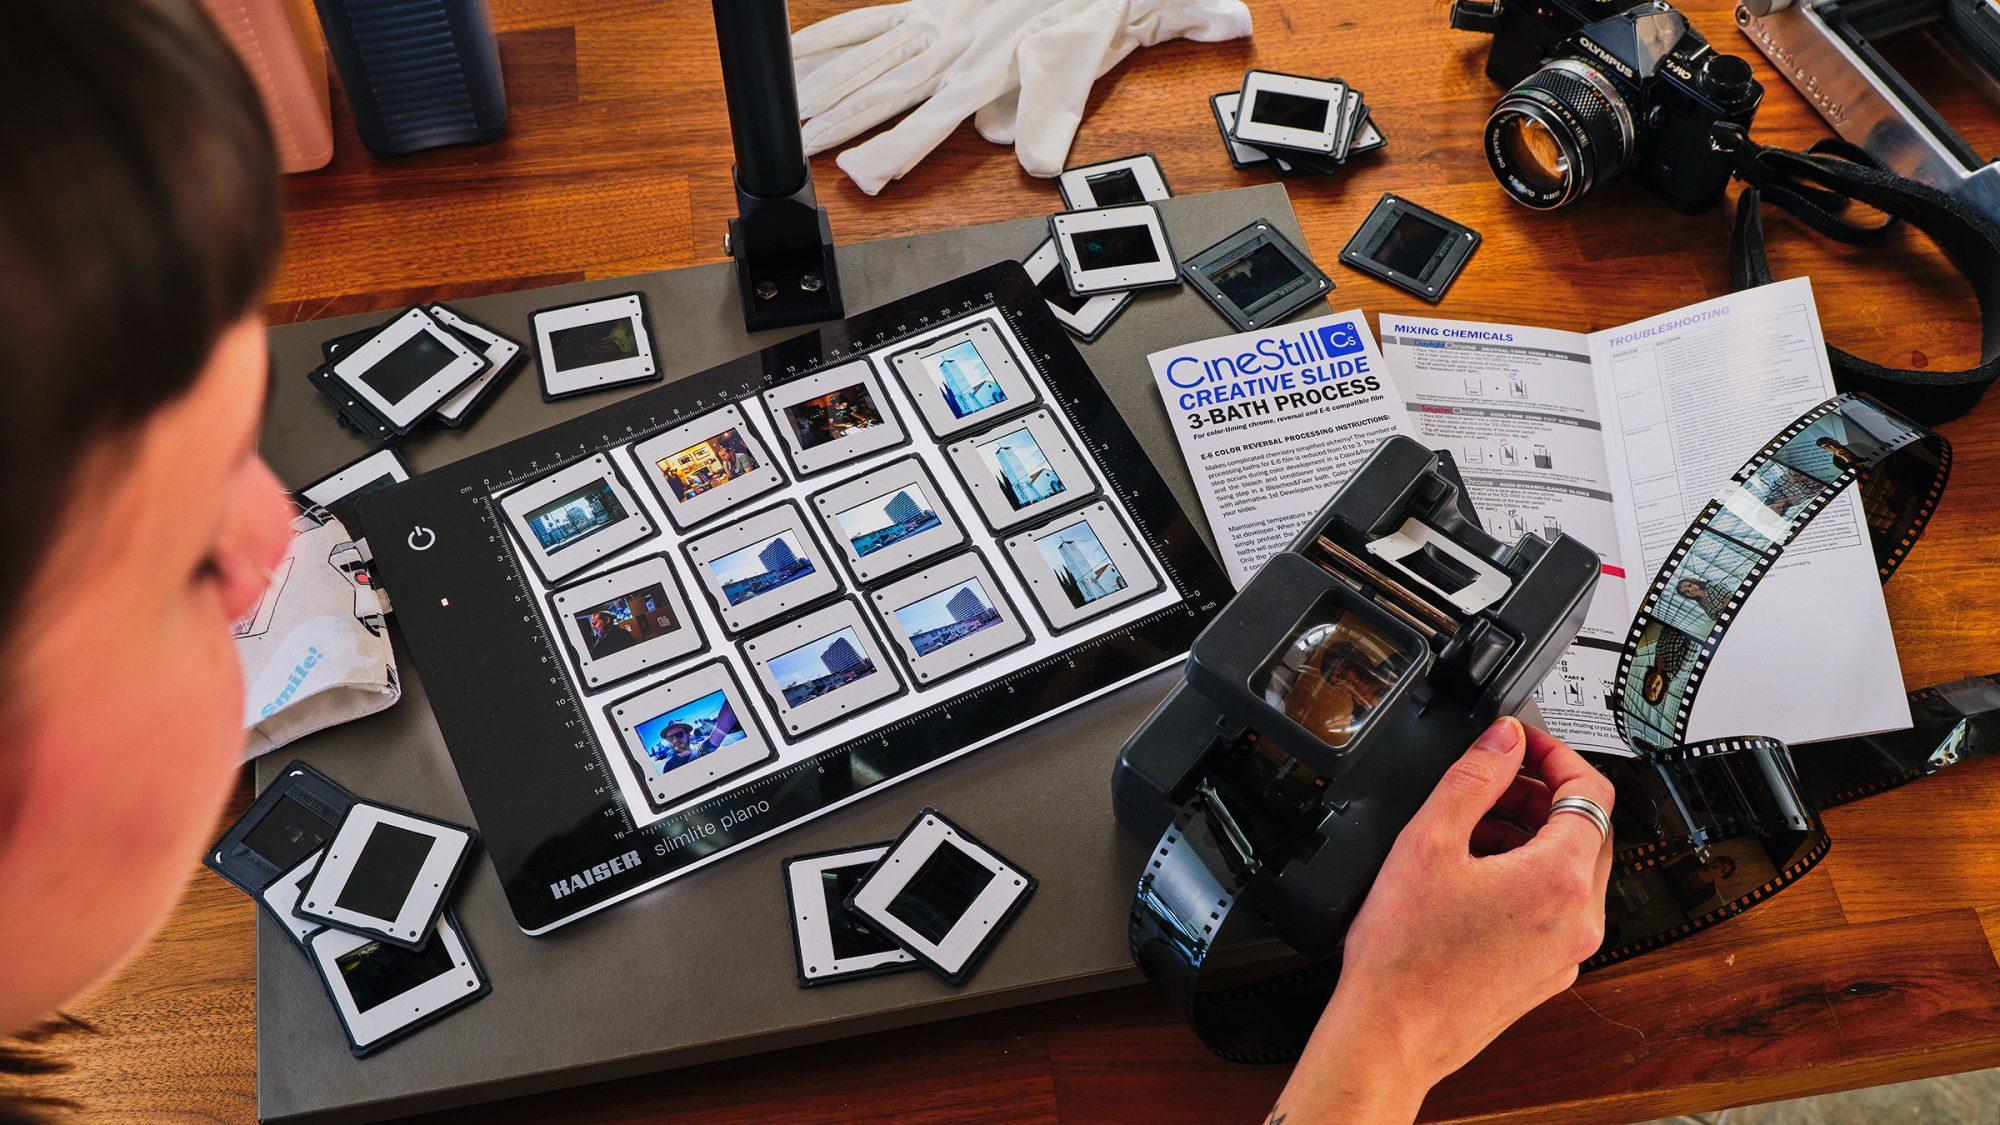 E6 films and camera (Pic: Cinestill)